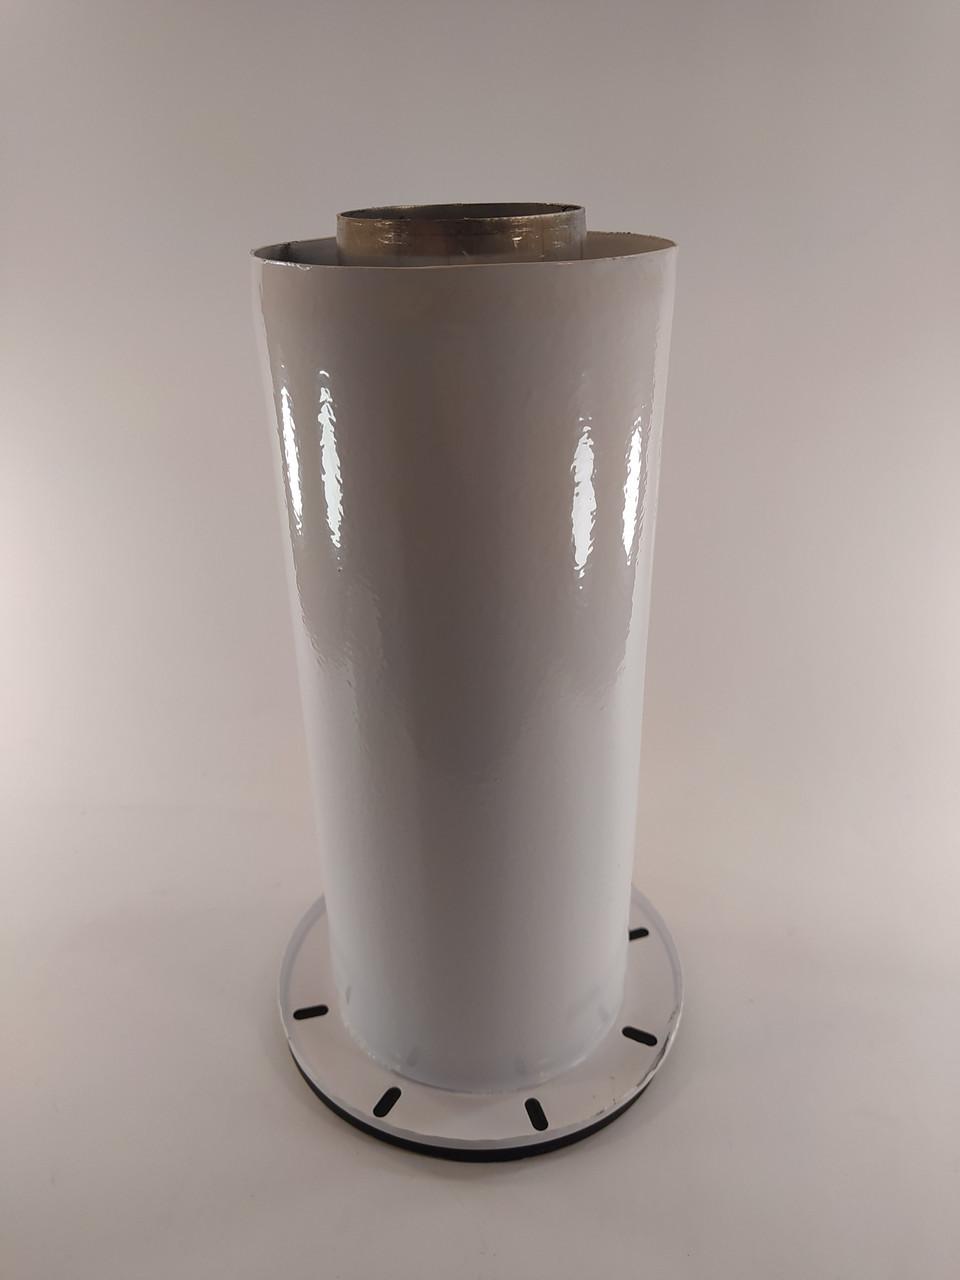 Адаптер фланцевый 60/100 для коаксиального дымохода